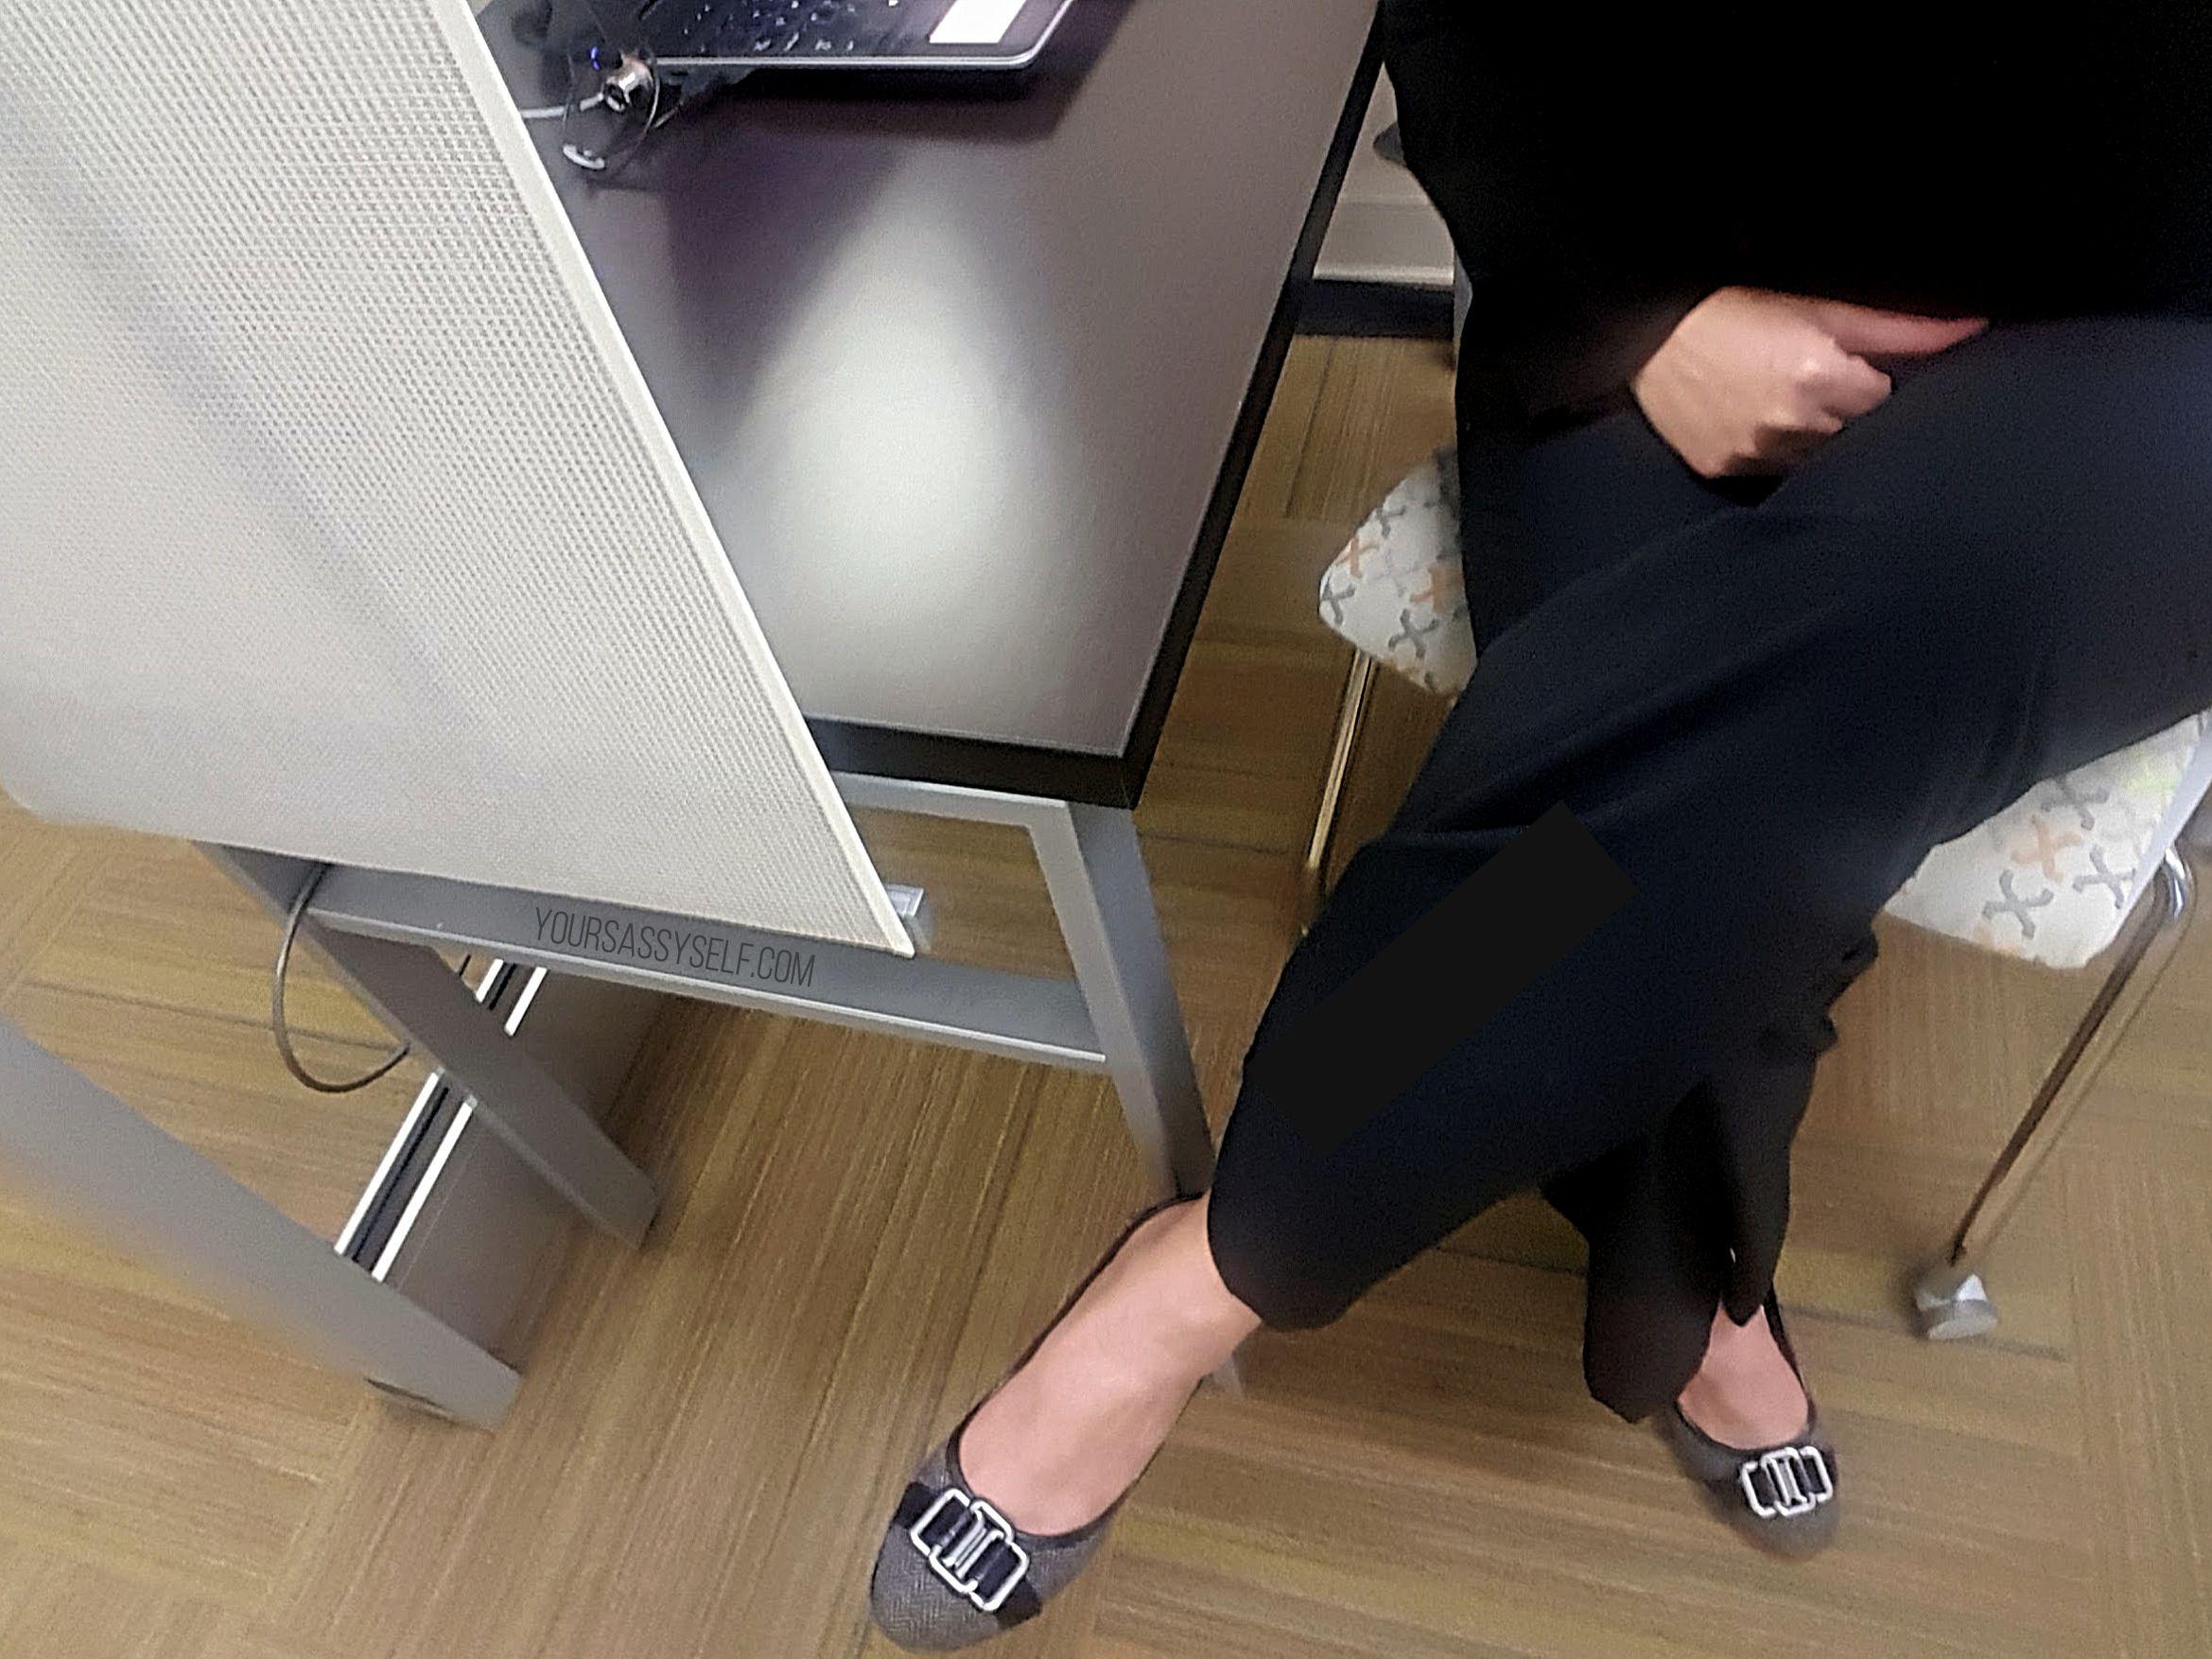 Sitting at Work - yoursassyselfcom